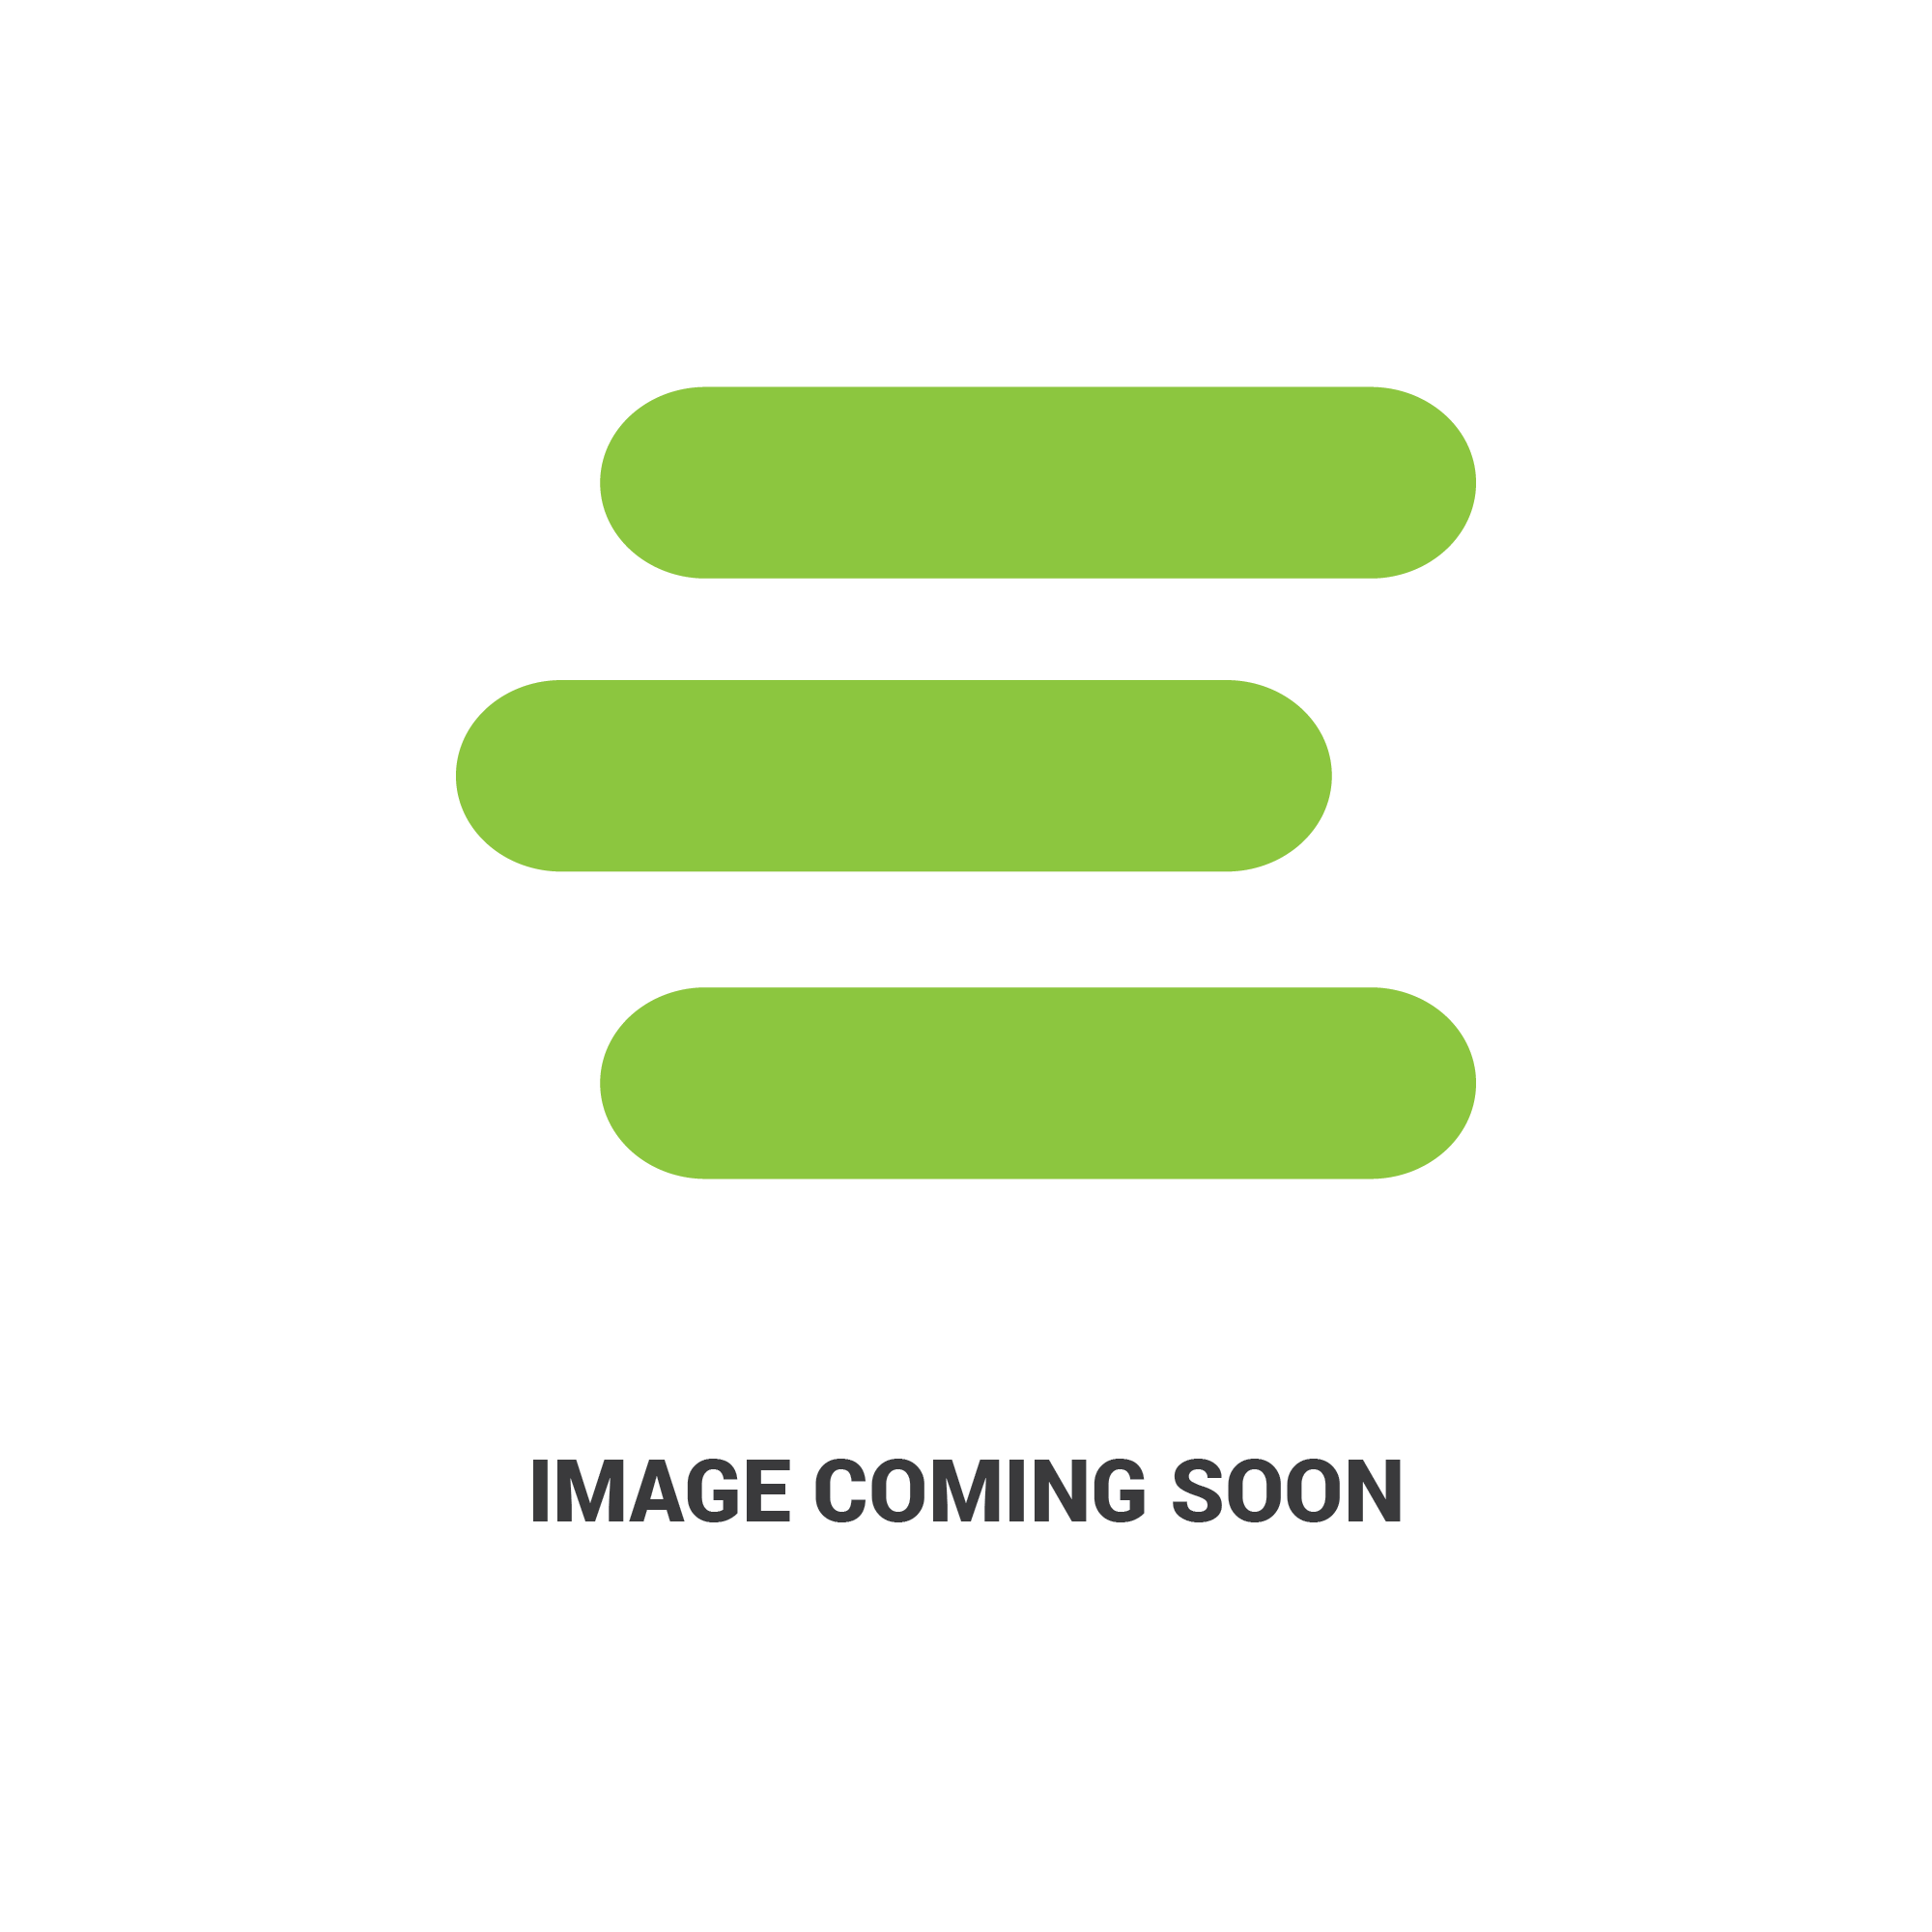 E-B500199edit 1.jpg